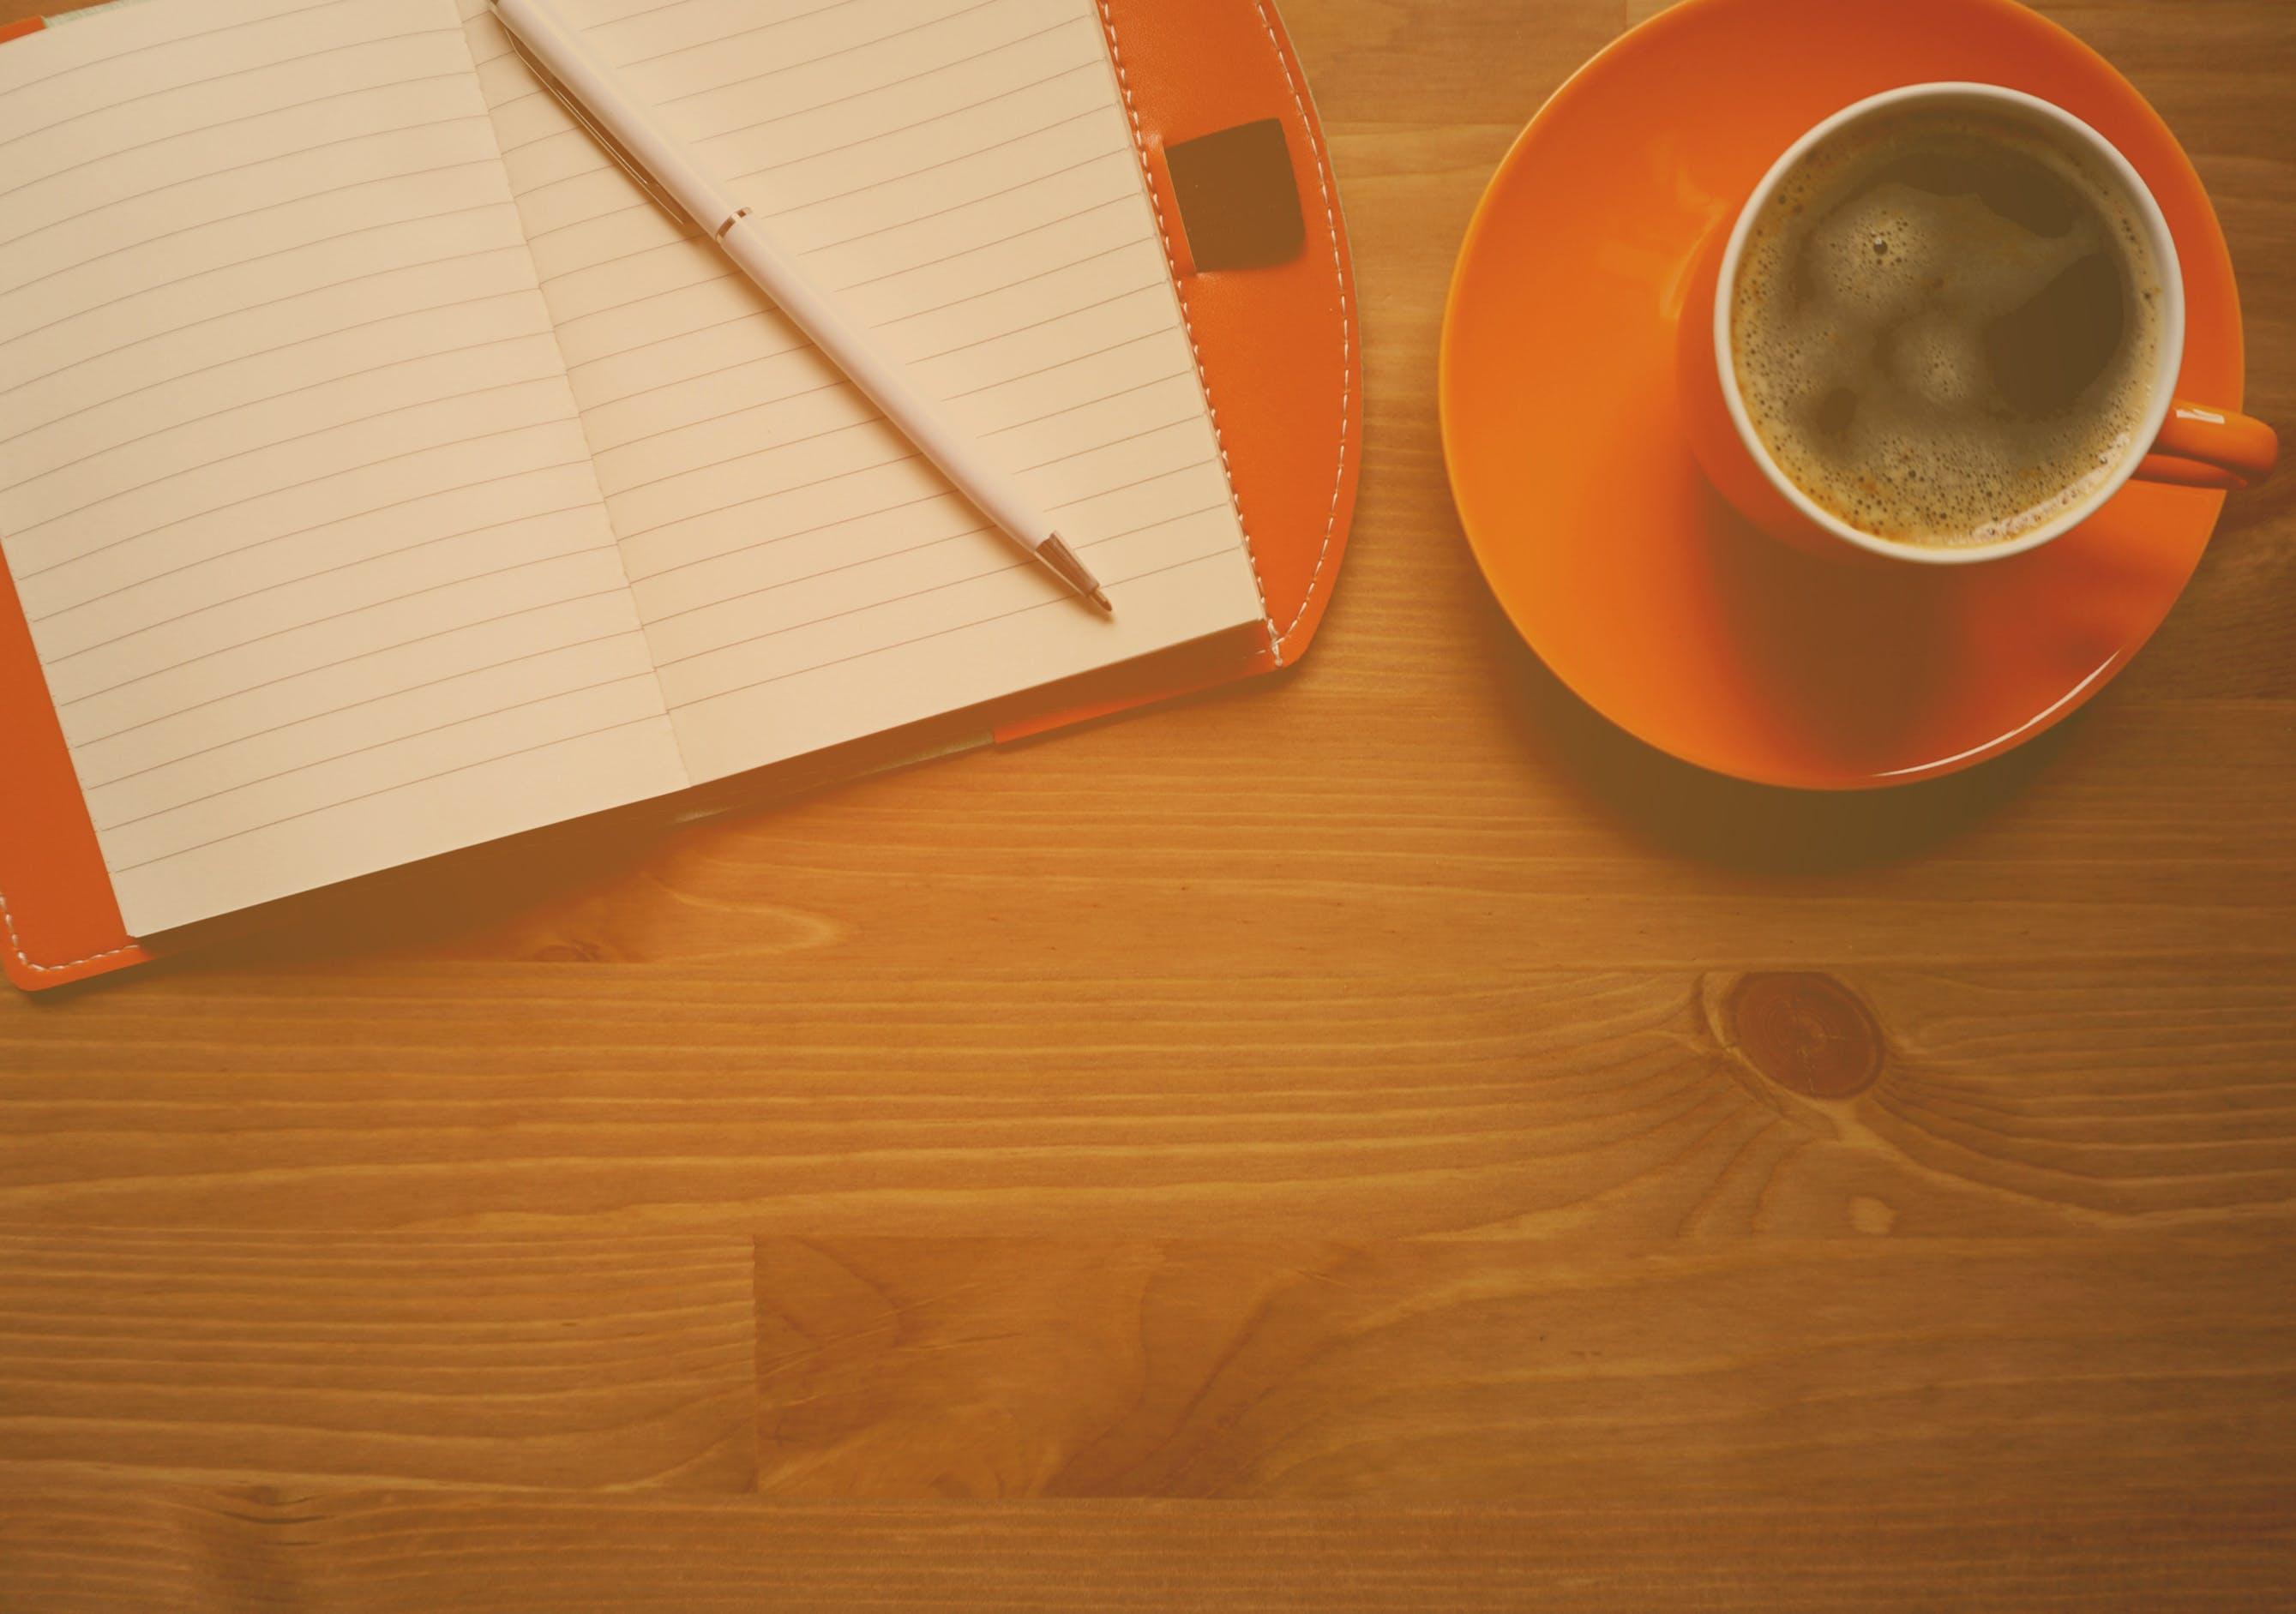 Orange Cup on Saucer